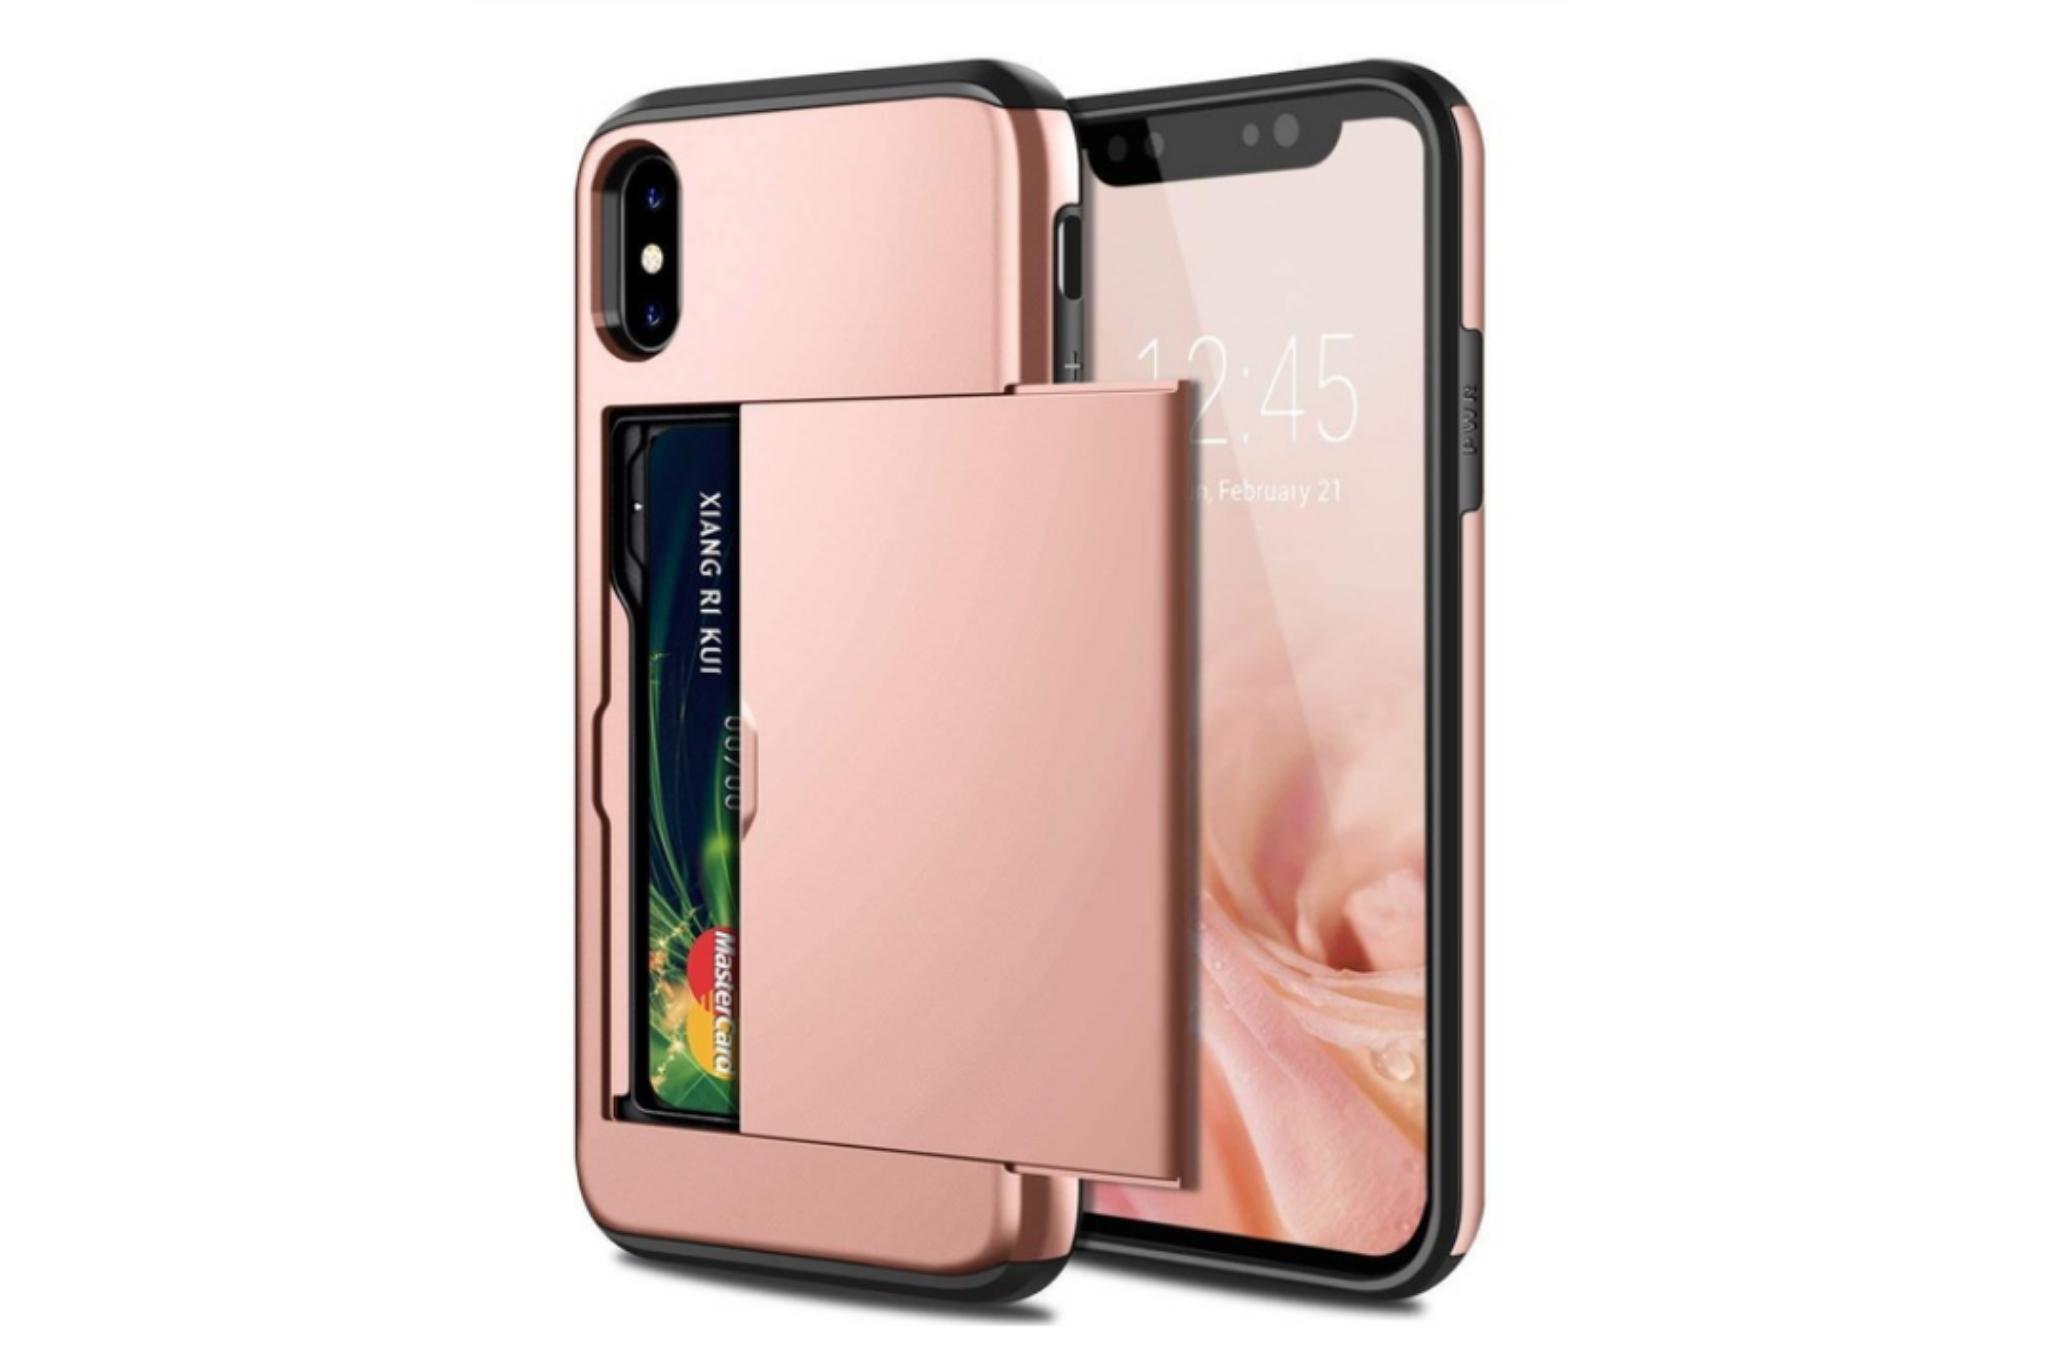 Smartphonehoesje iPhone XS Max | Pasjesschuif rose gold